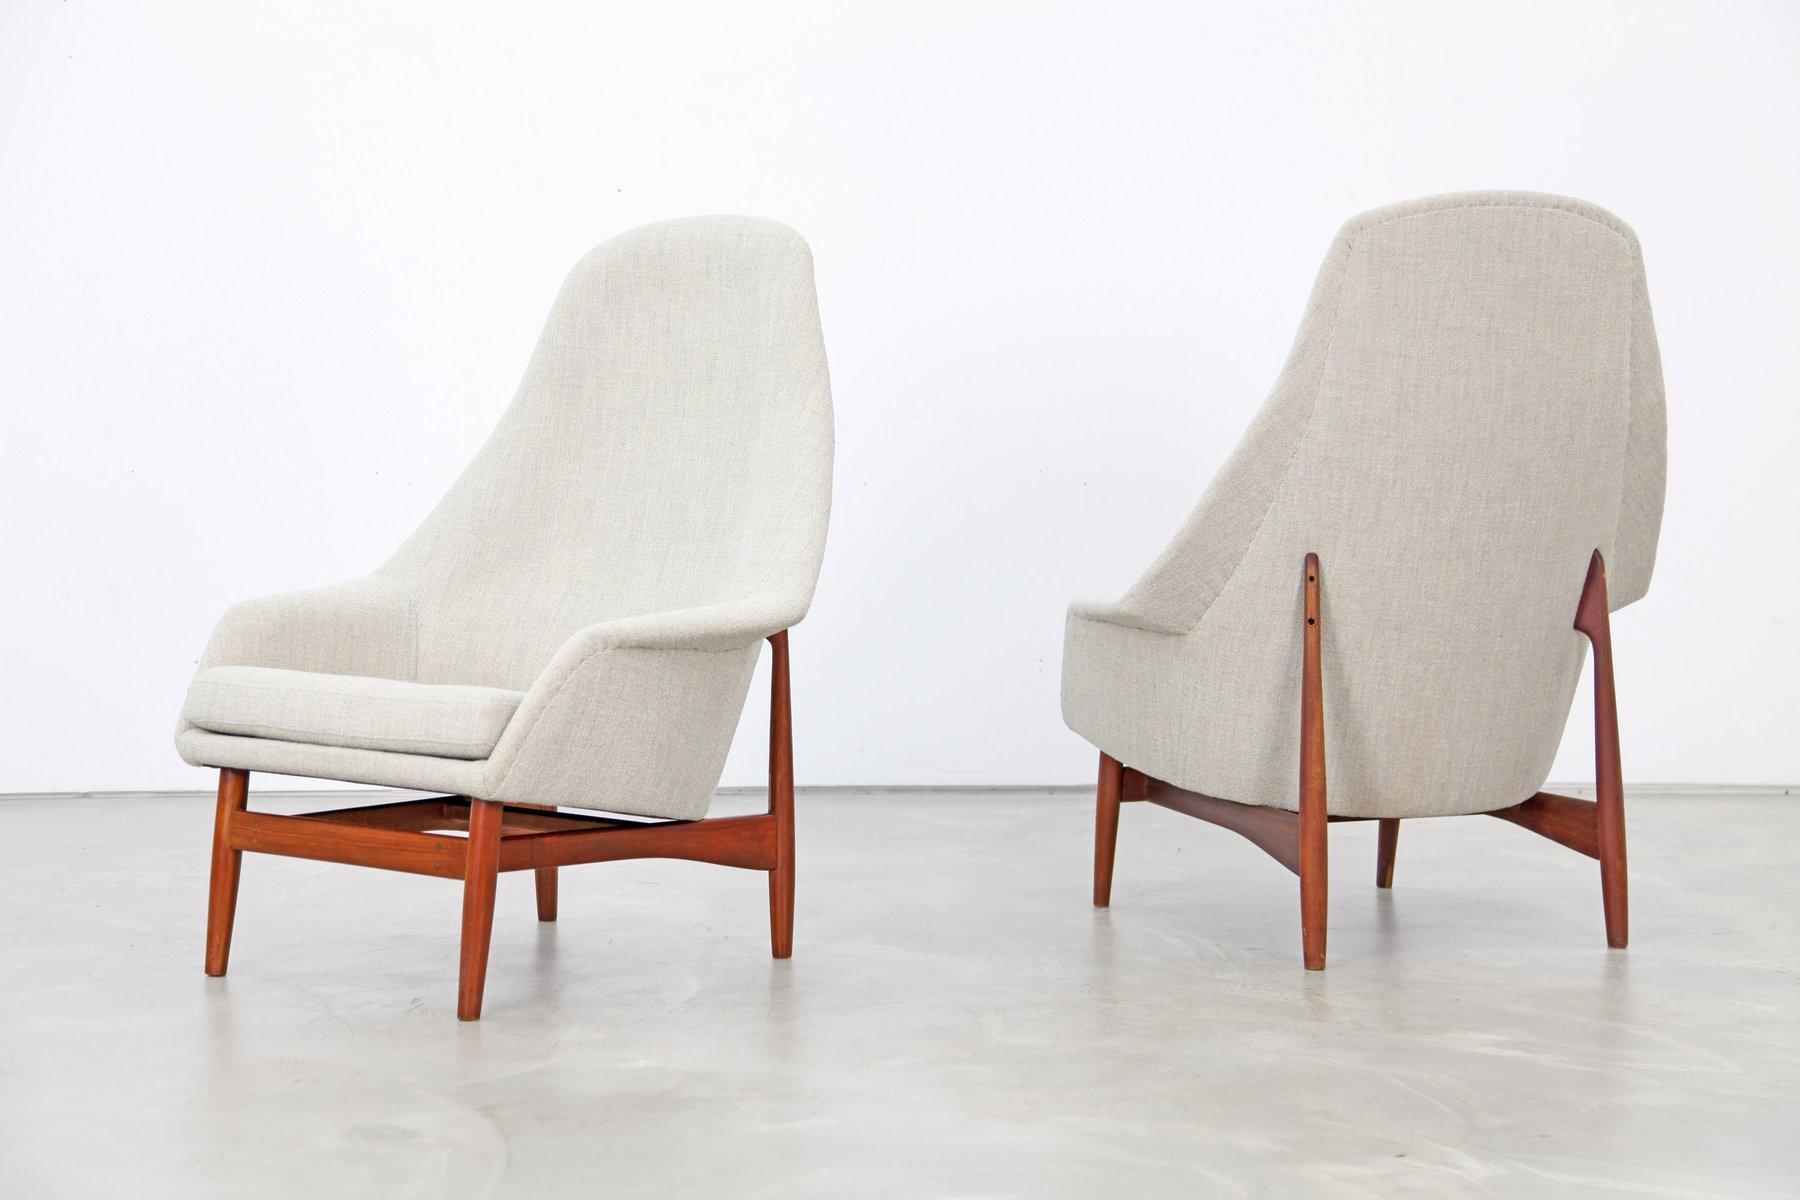 High Back Lounge Chairs By Ib Kofodlarsen, 1957, Set Of 2